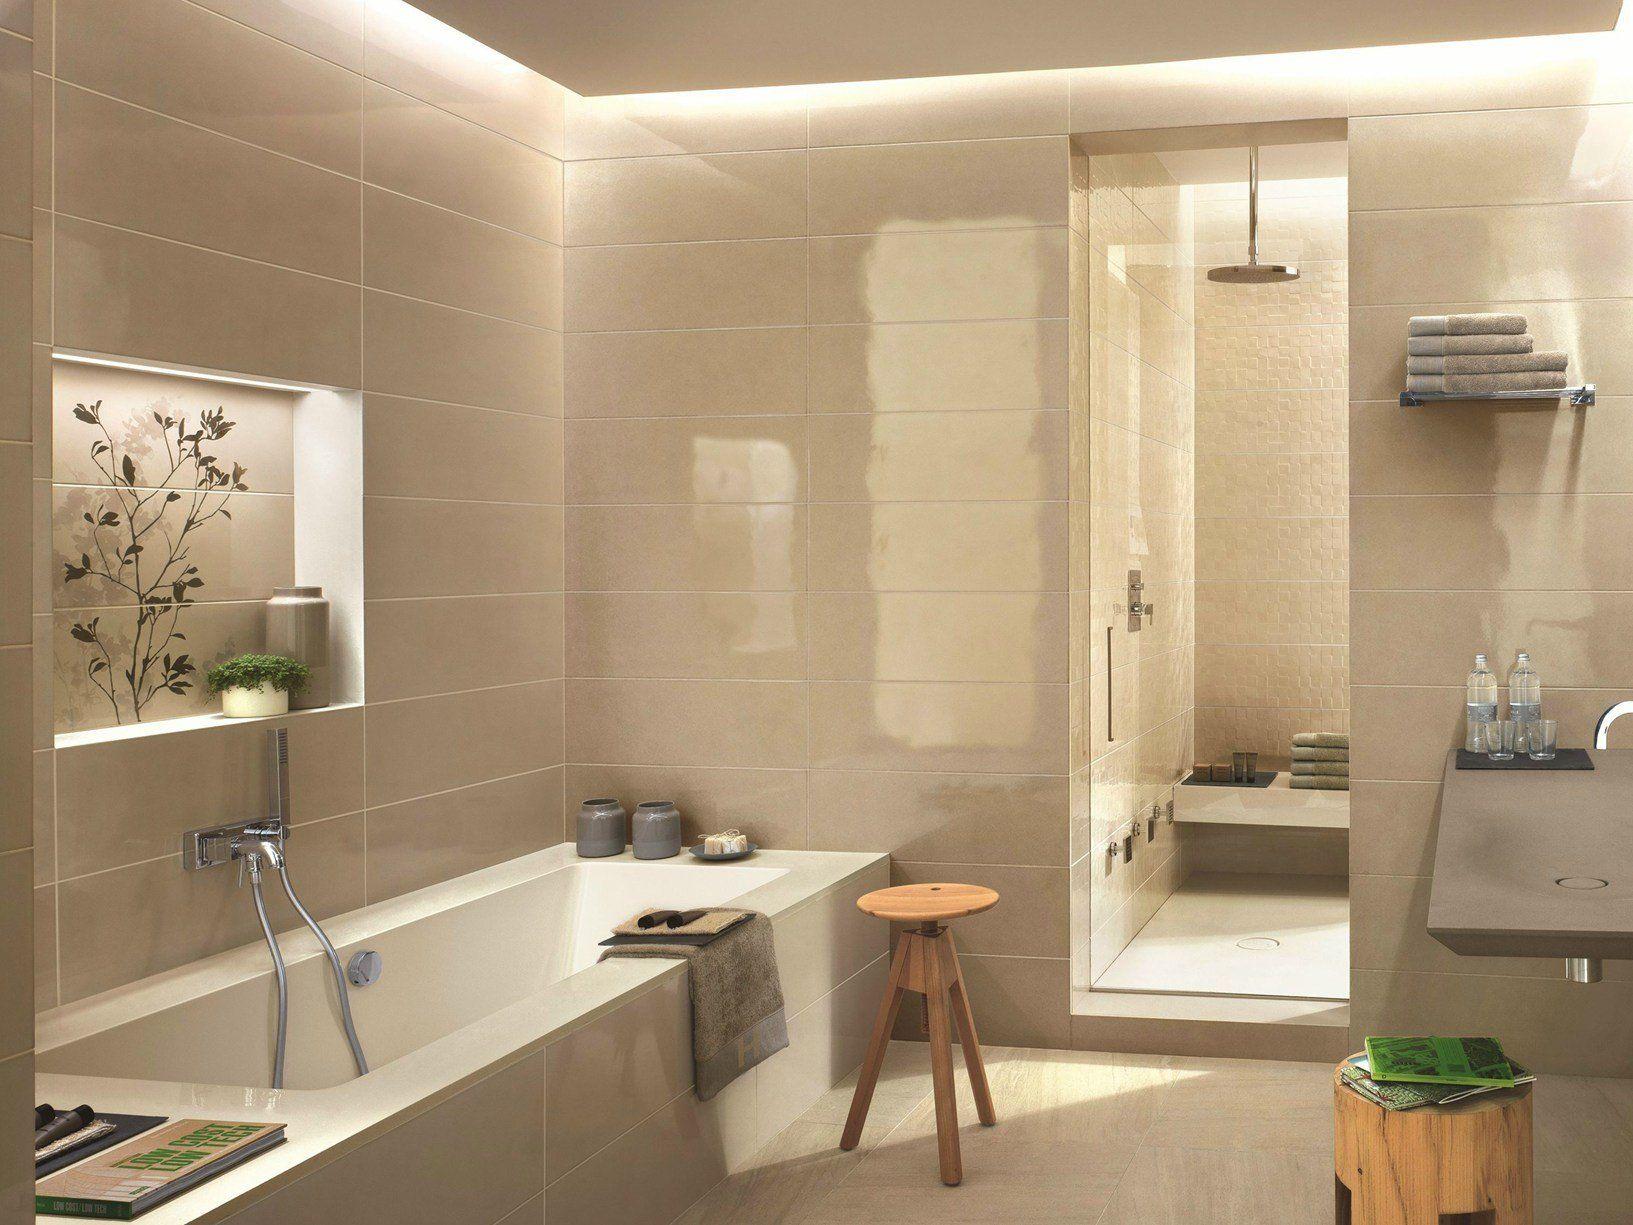 Ragno interpreta l ambiente bagno con handmade